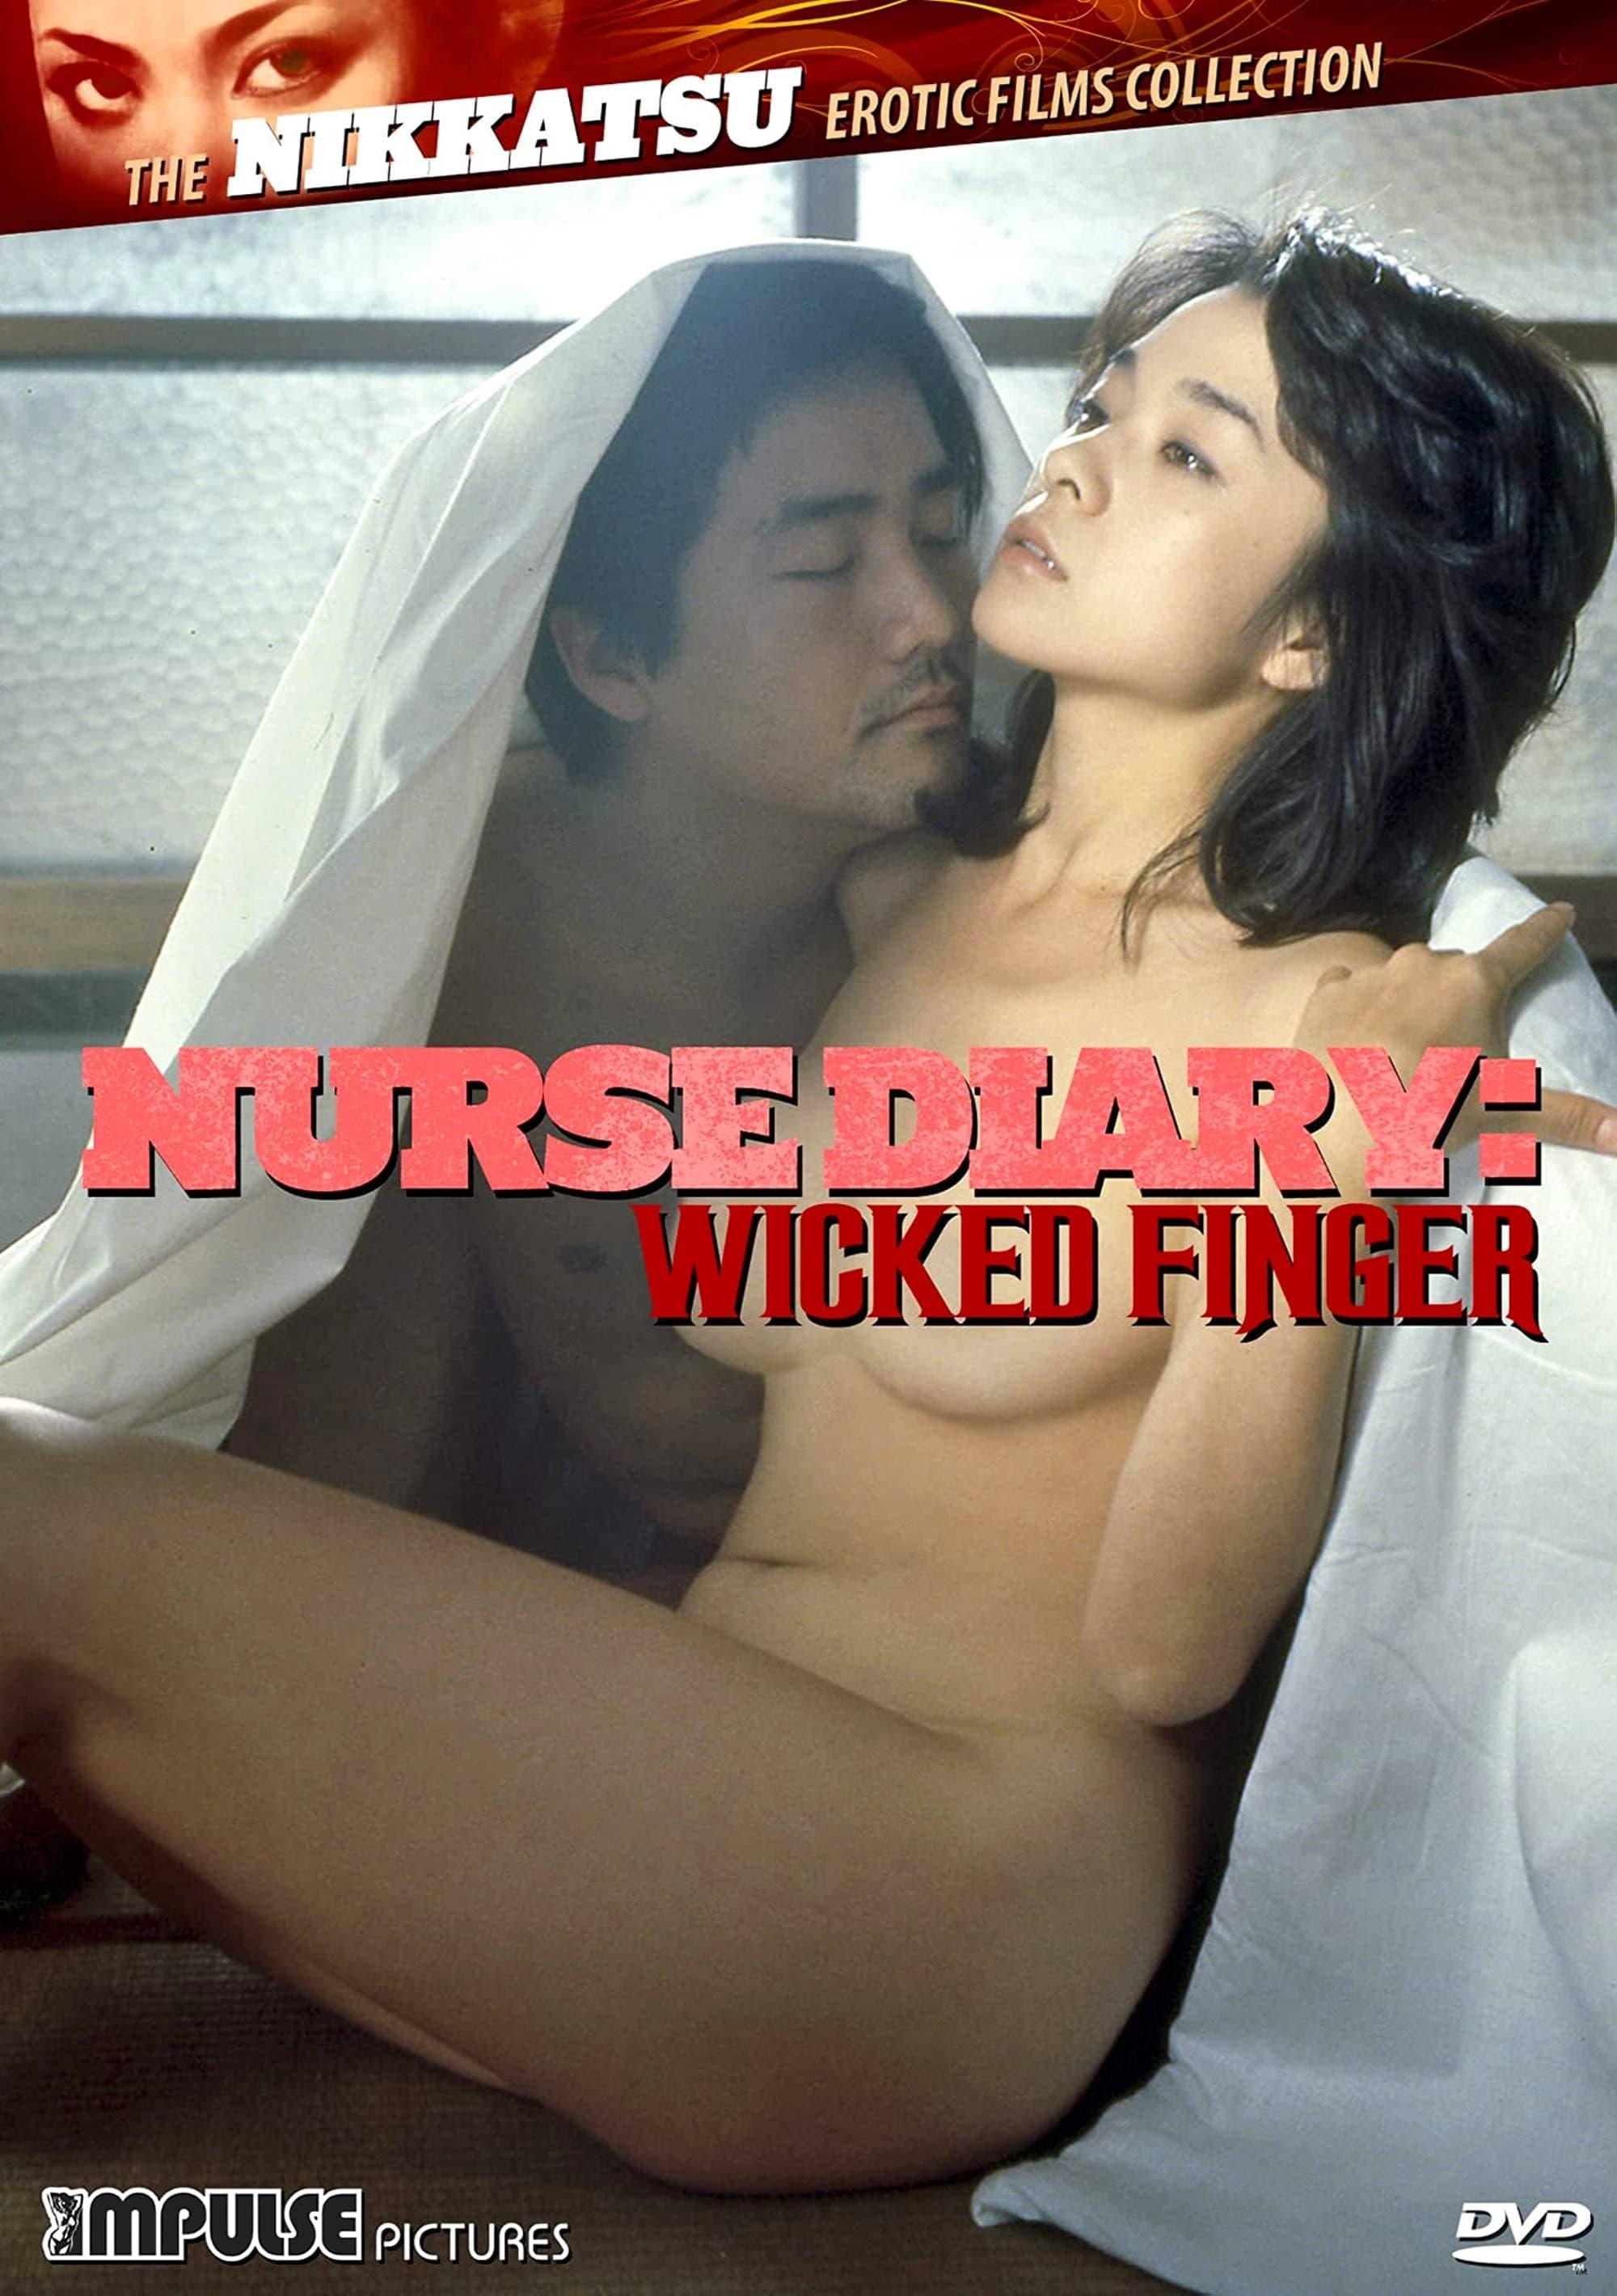 Nurse Diary: Wicked Finger